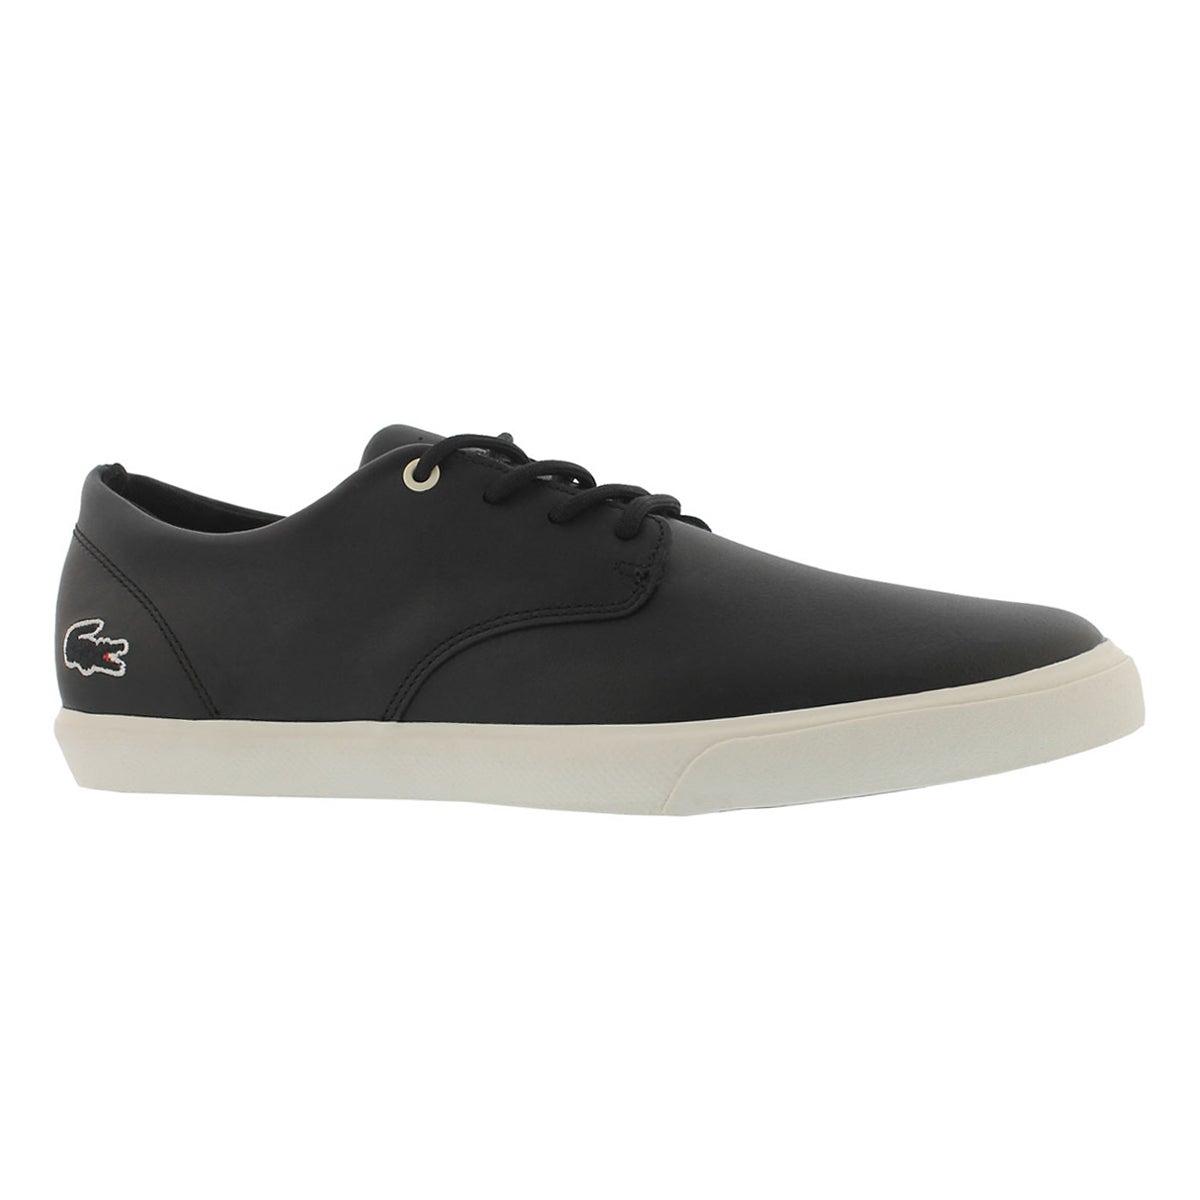 Men's ACITUS 118 1 P black/white sneaker